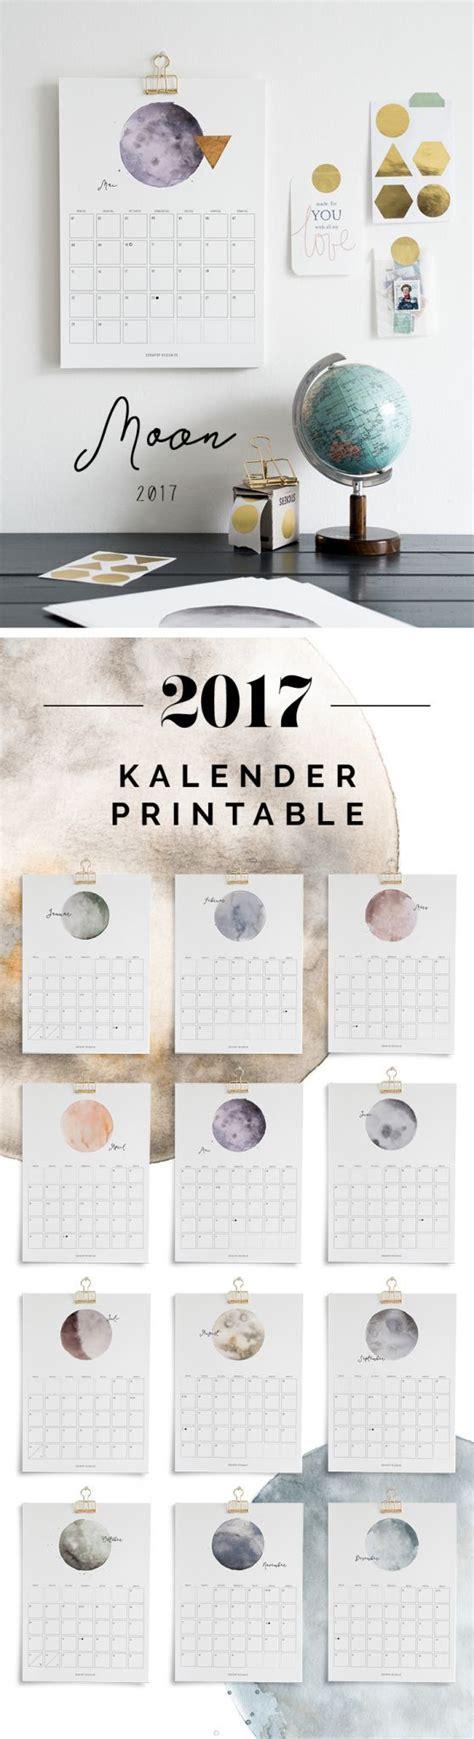 sodapop design kalender 25 best ideas about calender print on pinterest free